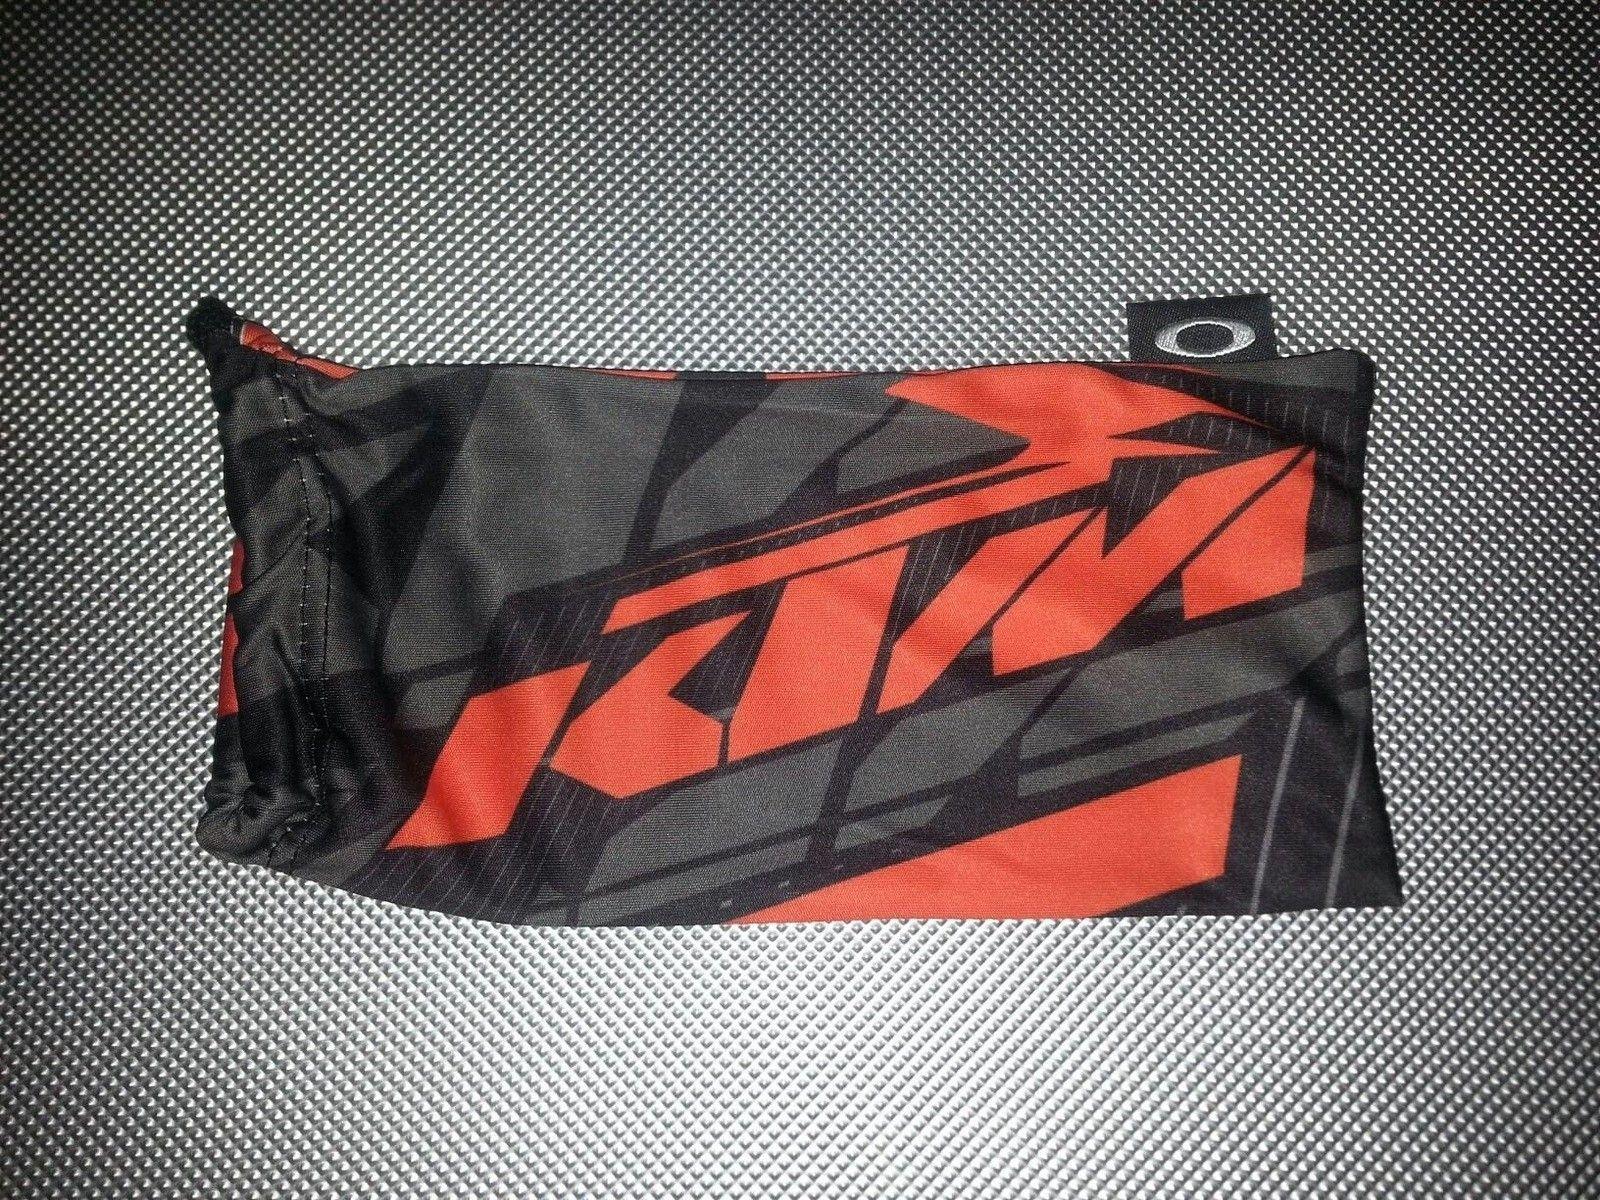 KTM Microbag - image.jpg